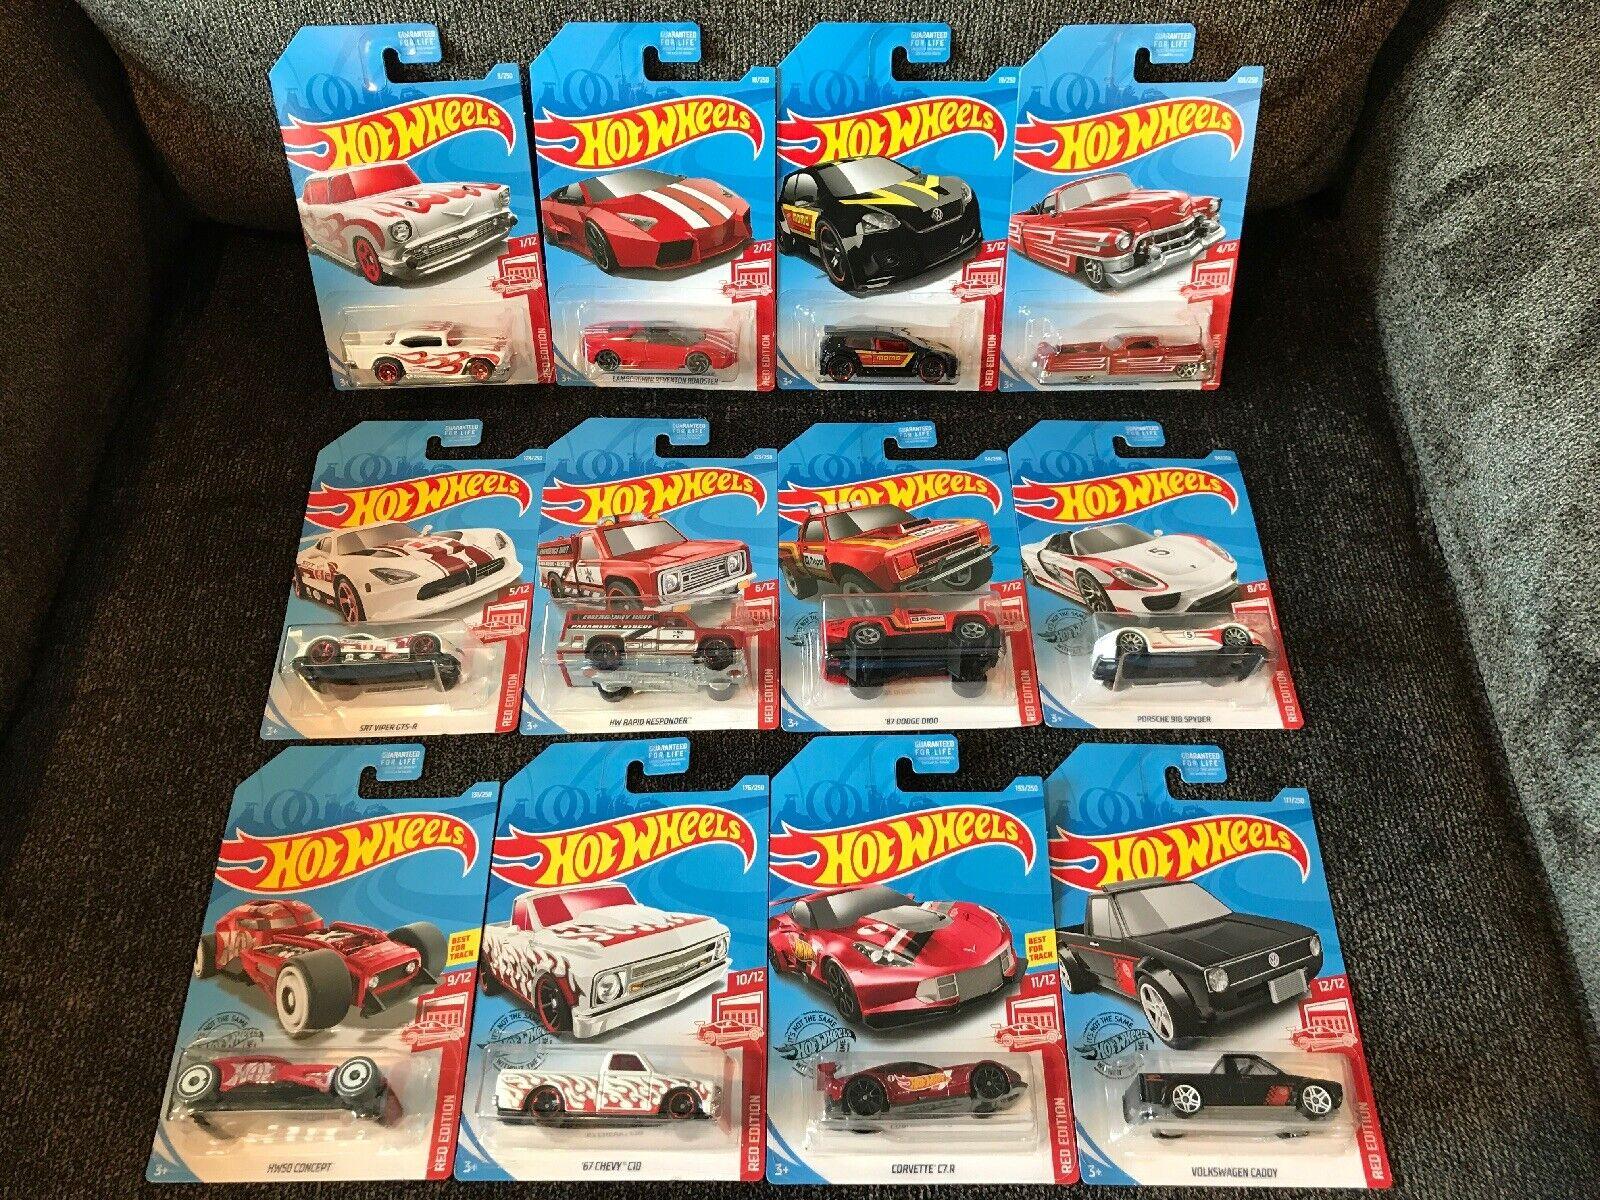 Hot Wheels 2019 Target Red Edition Complete 12 Car Set (Chevy C10, Porsche)